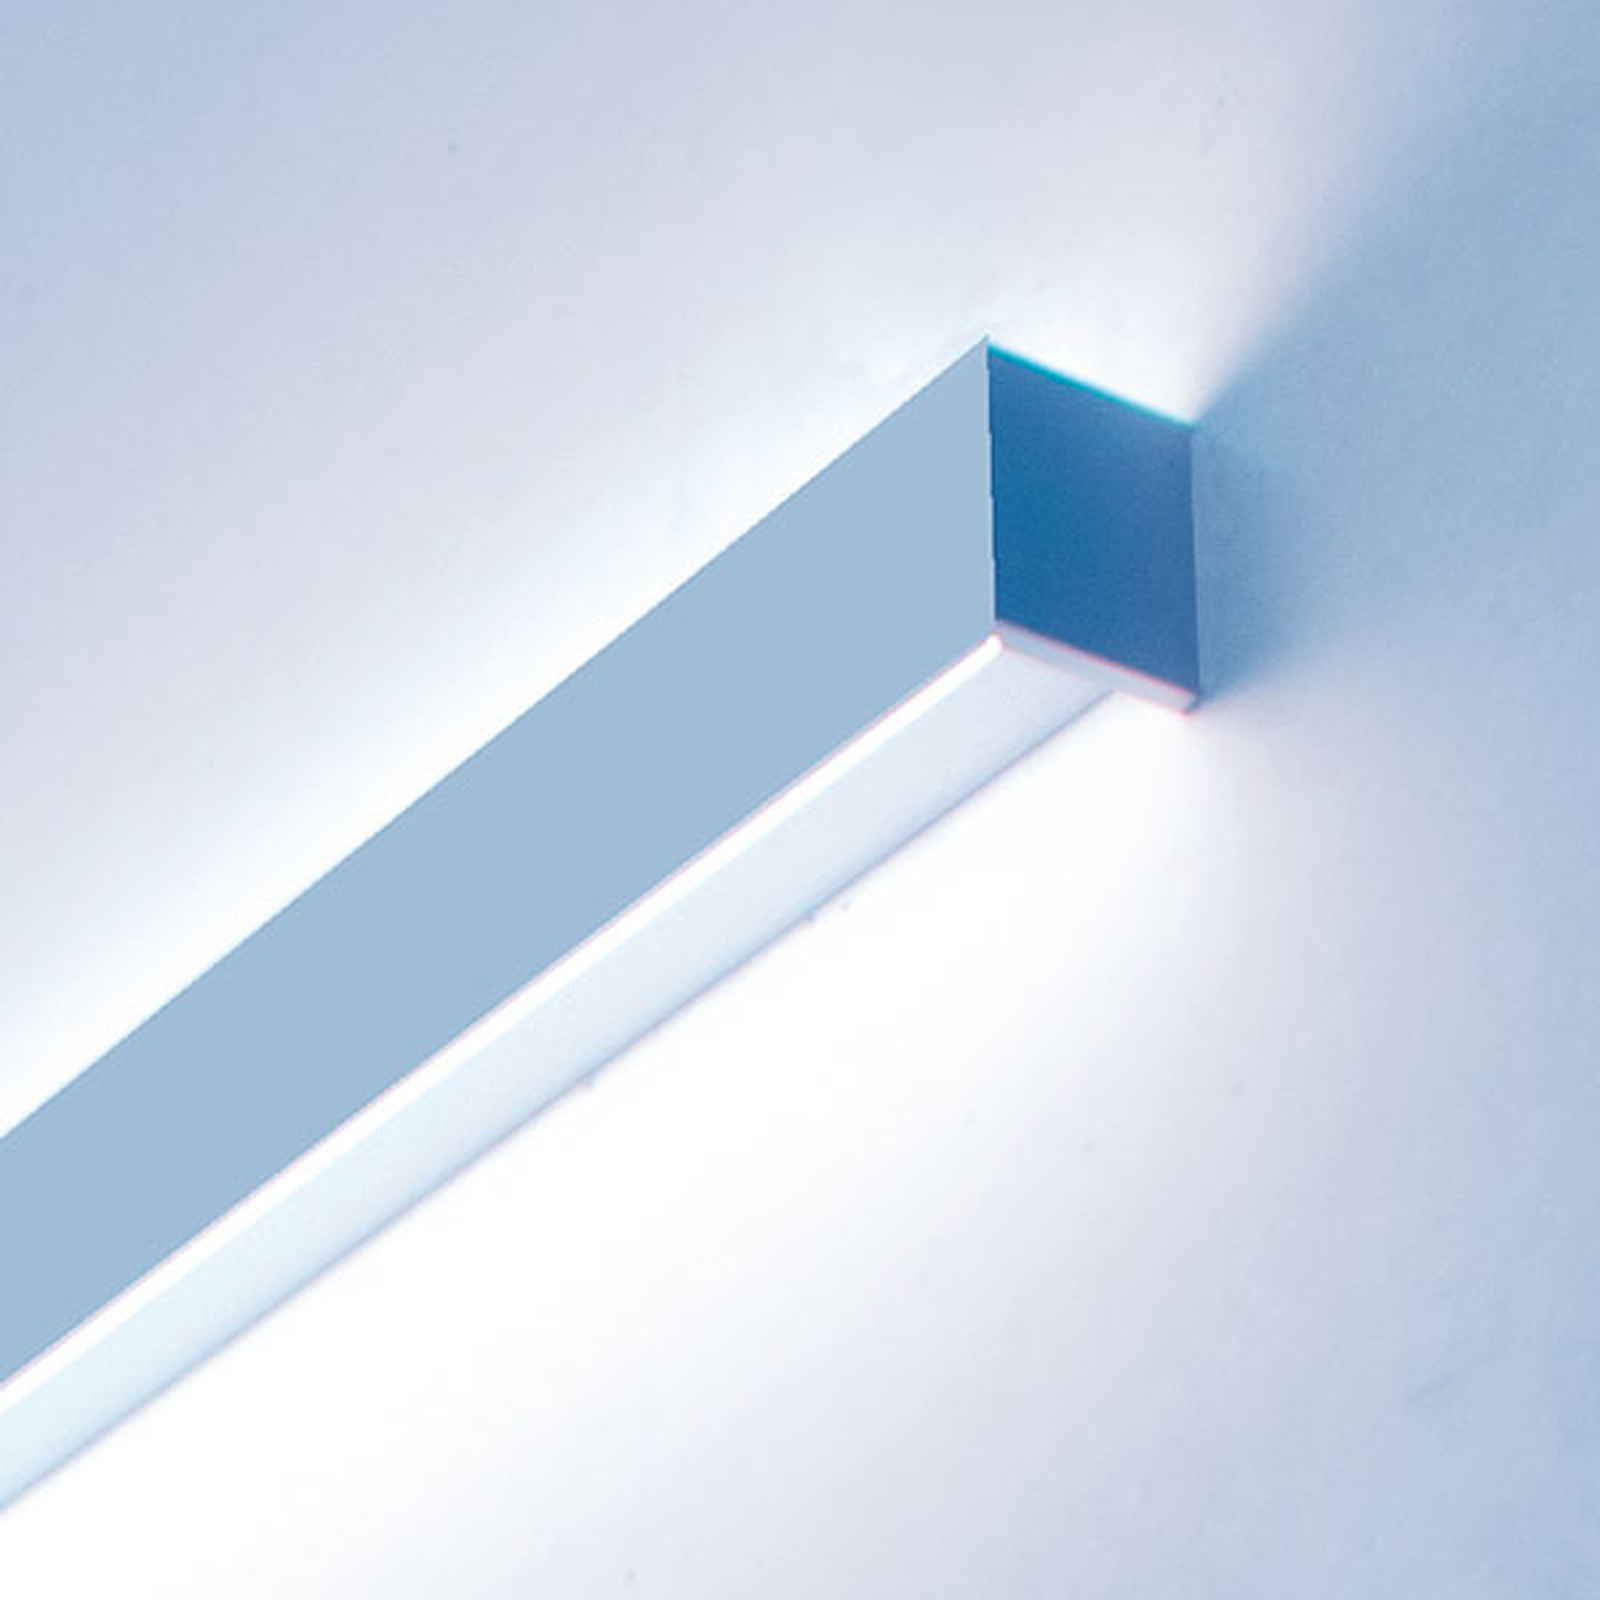 Matric W1 LED-vegglampe i 60 cm, 3 000 K